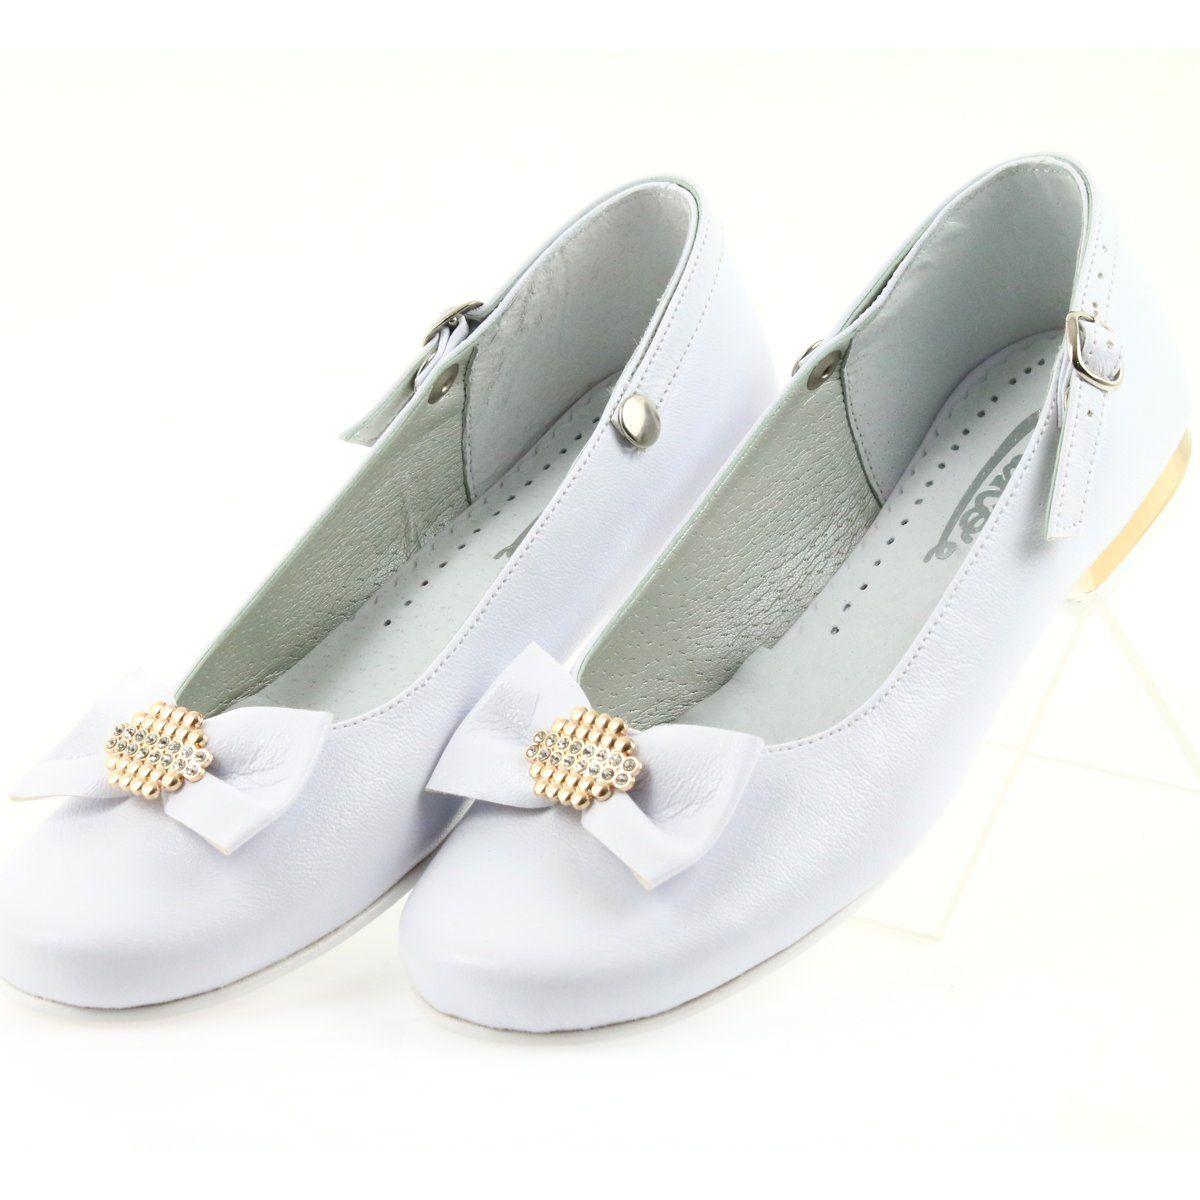 Miko Czolenka Dzieciece Balerinki Komunijne Biale Zolte Kid Shoes Ballerina Kids White Shoes